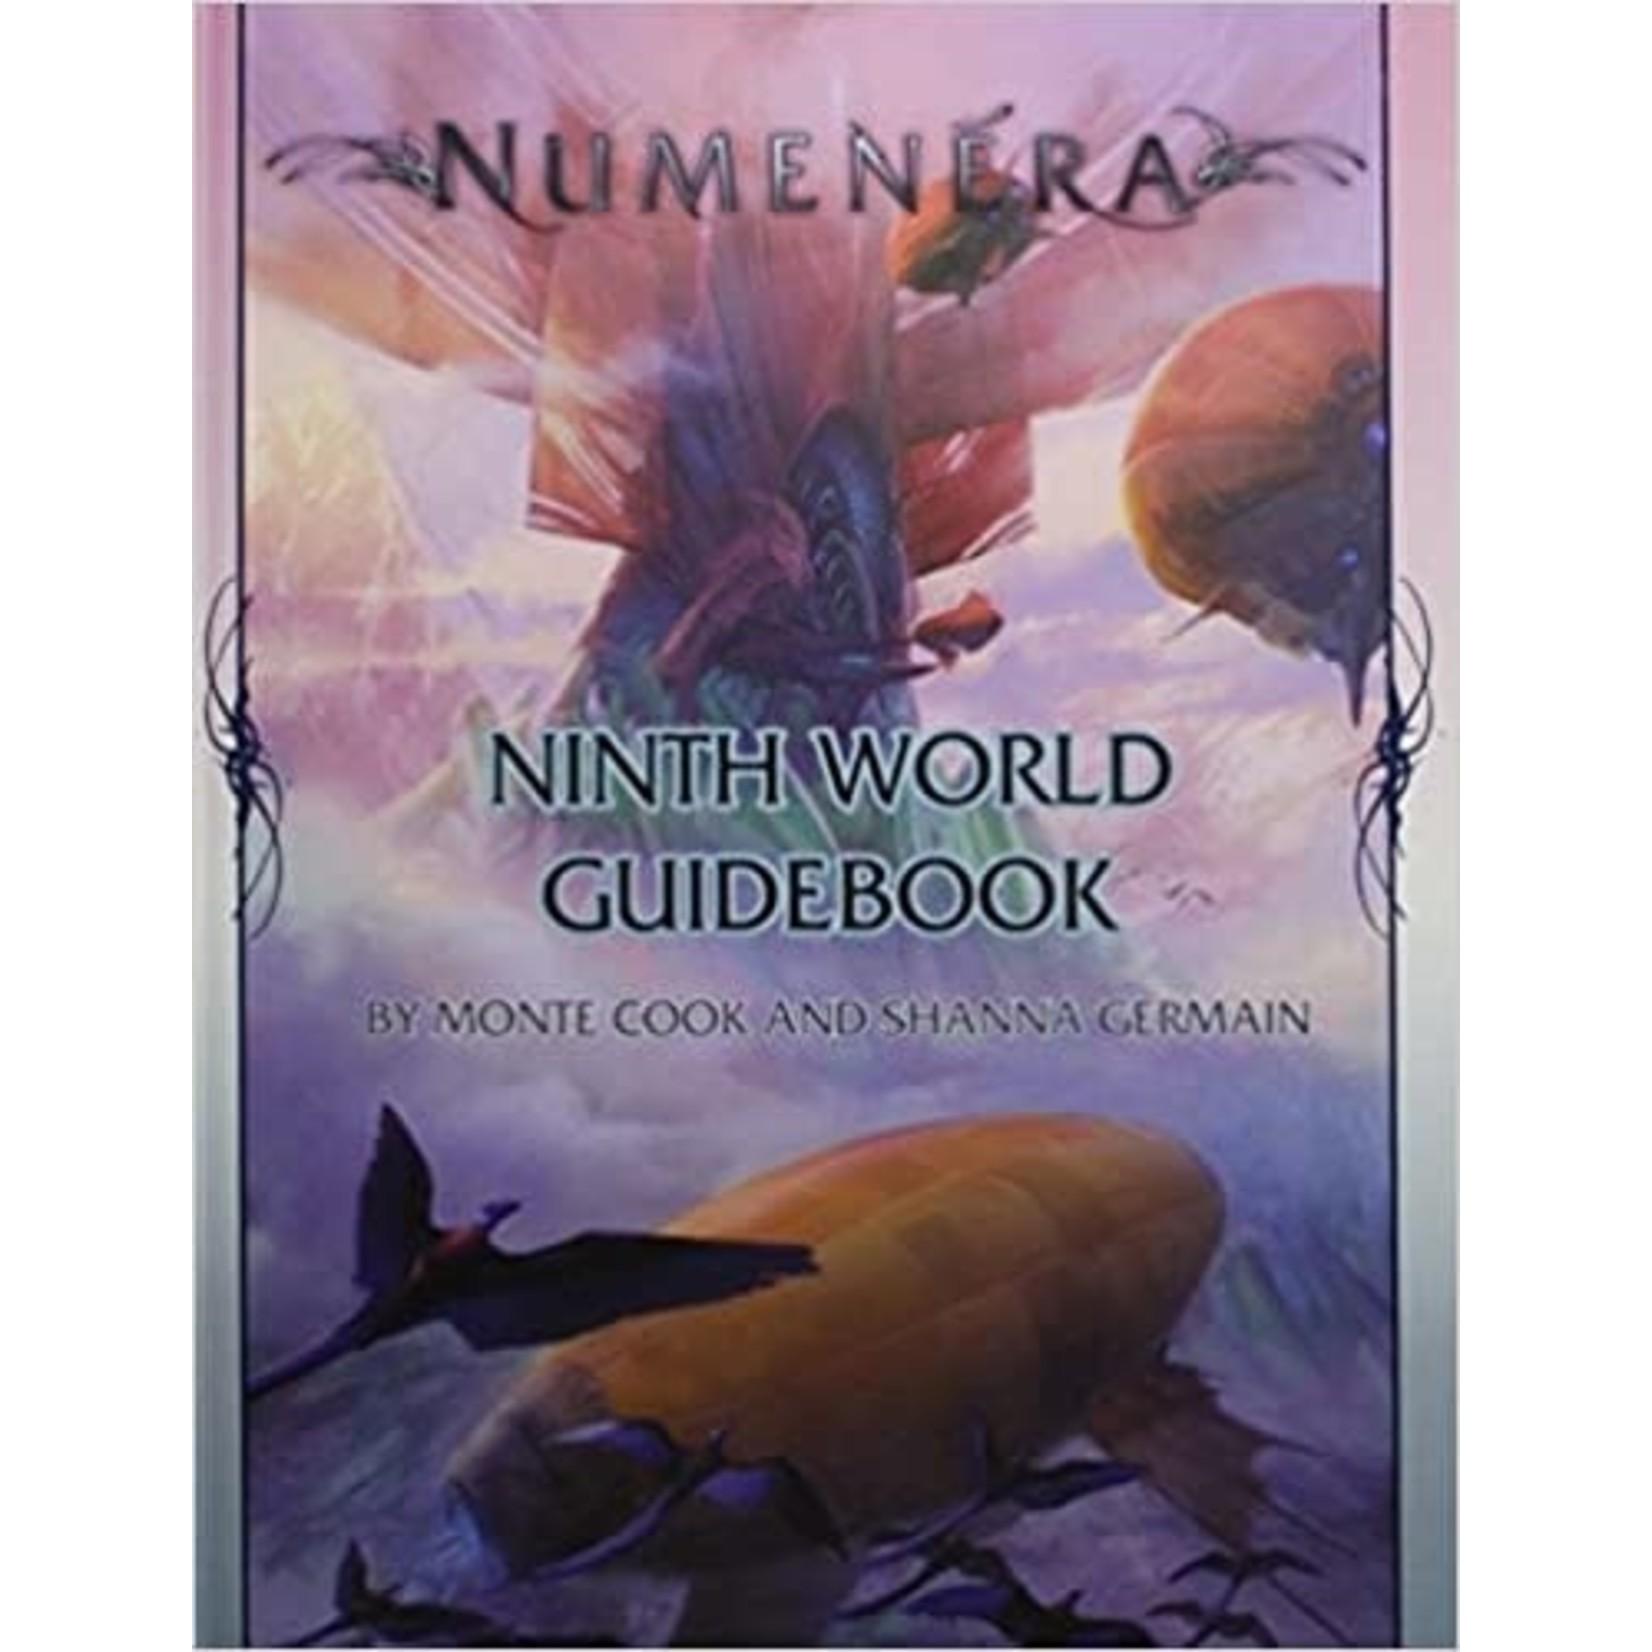 Numenera RPG Ninth World Guidebook